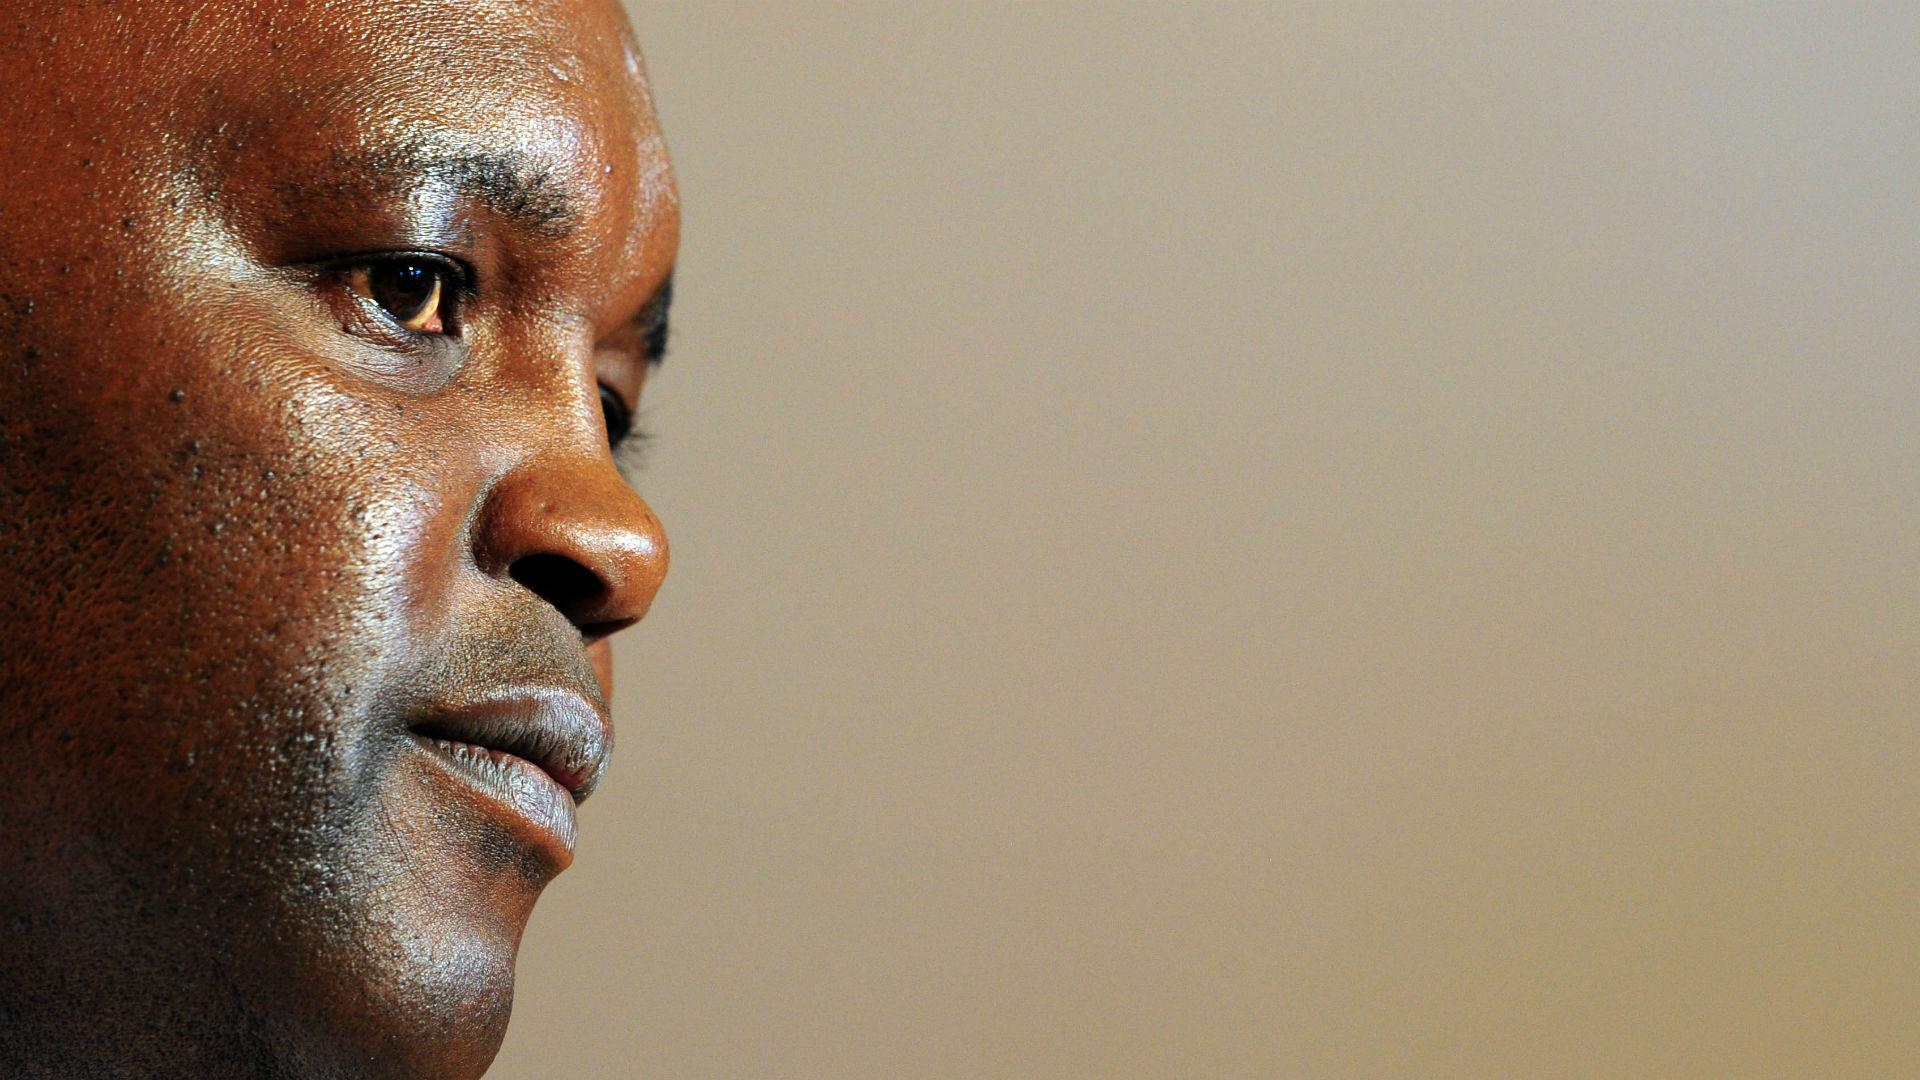 Mosimane: Watch South Africa's legendary coach bid emotional farewell to Mamelodi Sundowns